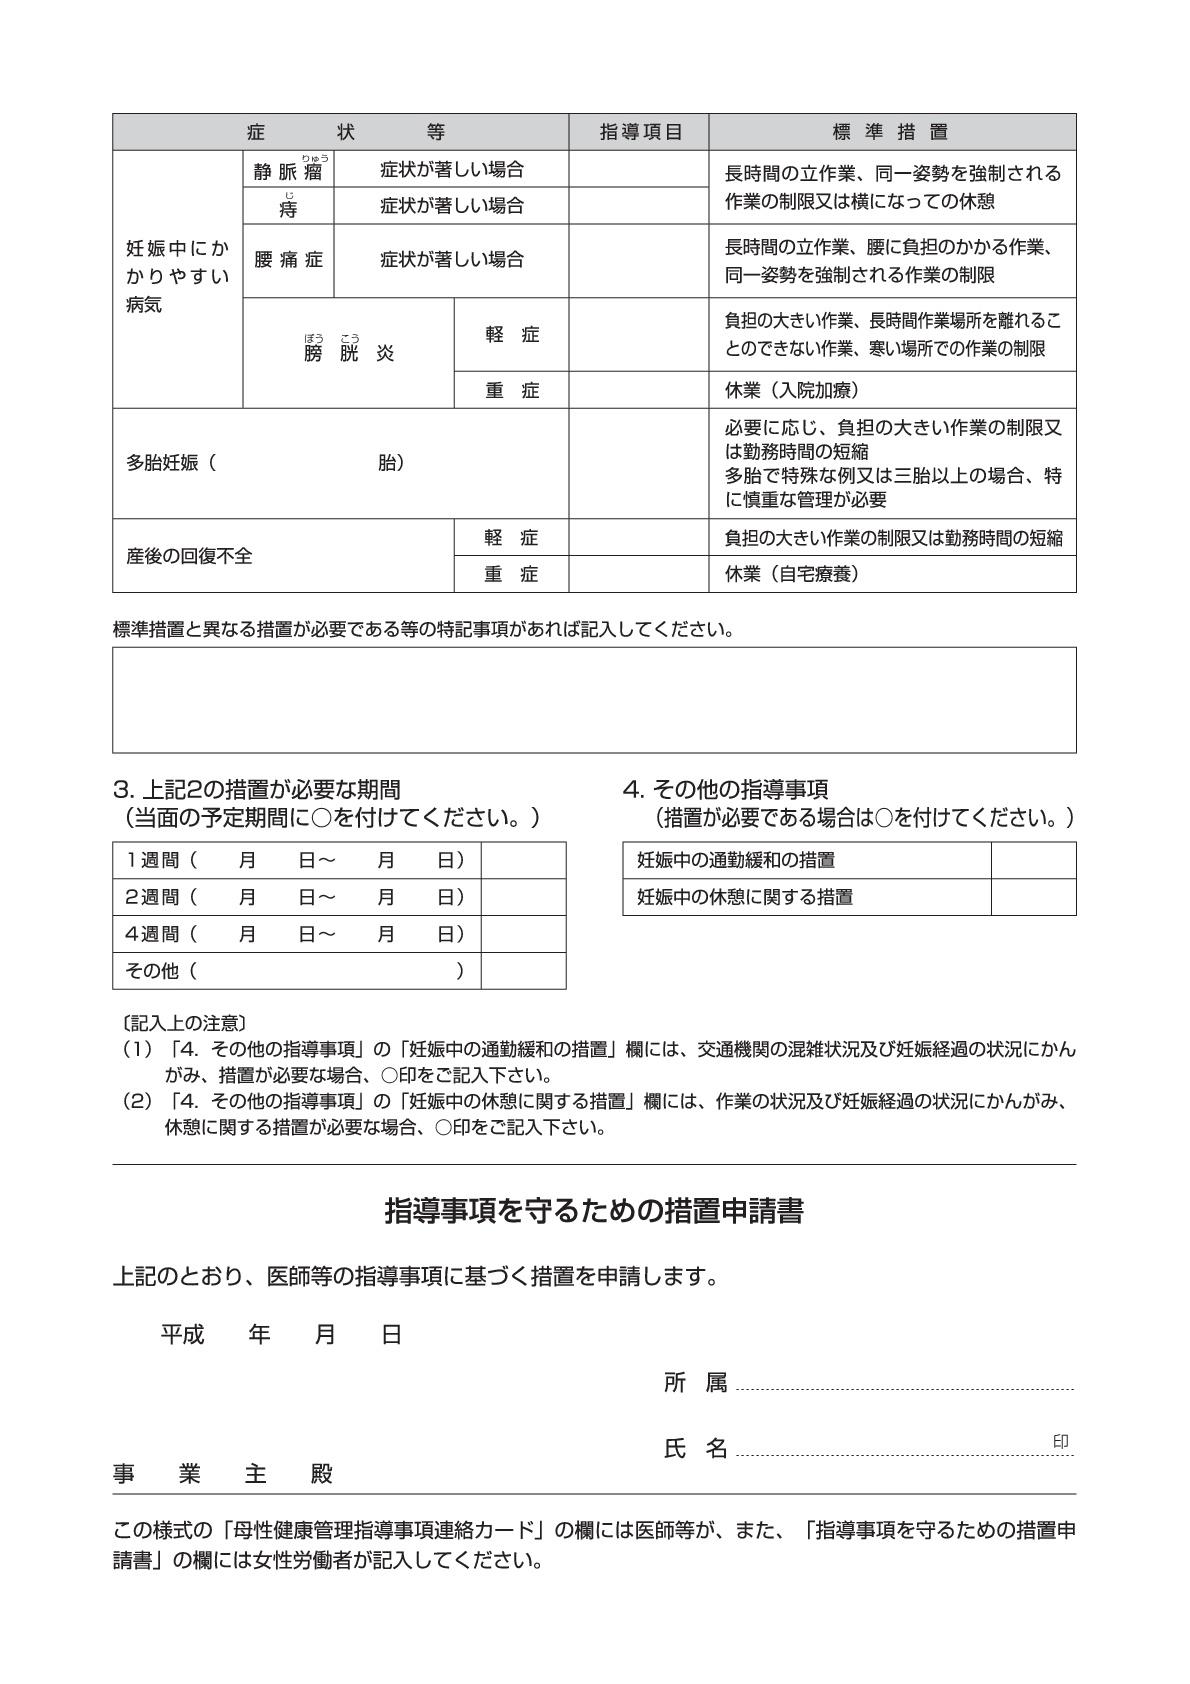 http://ritsuan.com/wp-content/uploads/2016/06/bosei_kenkoukanri-002.jpg